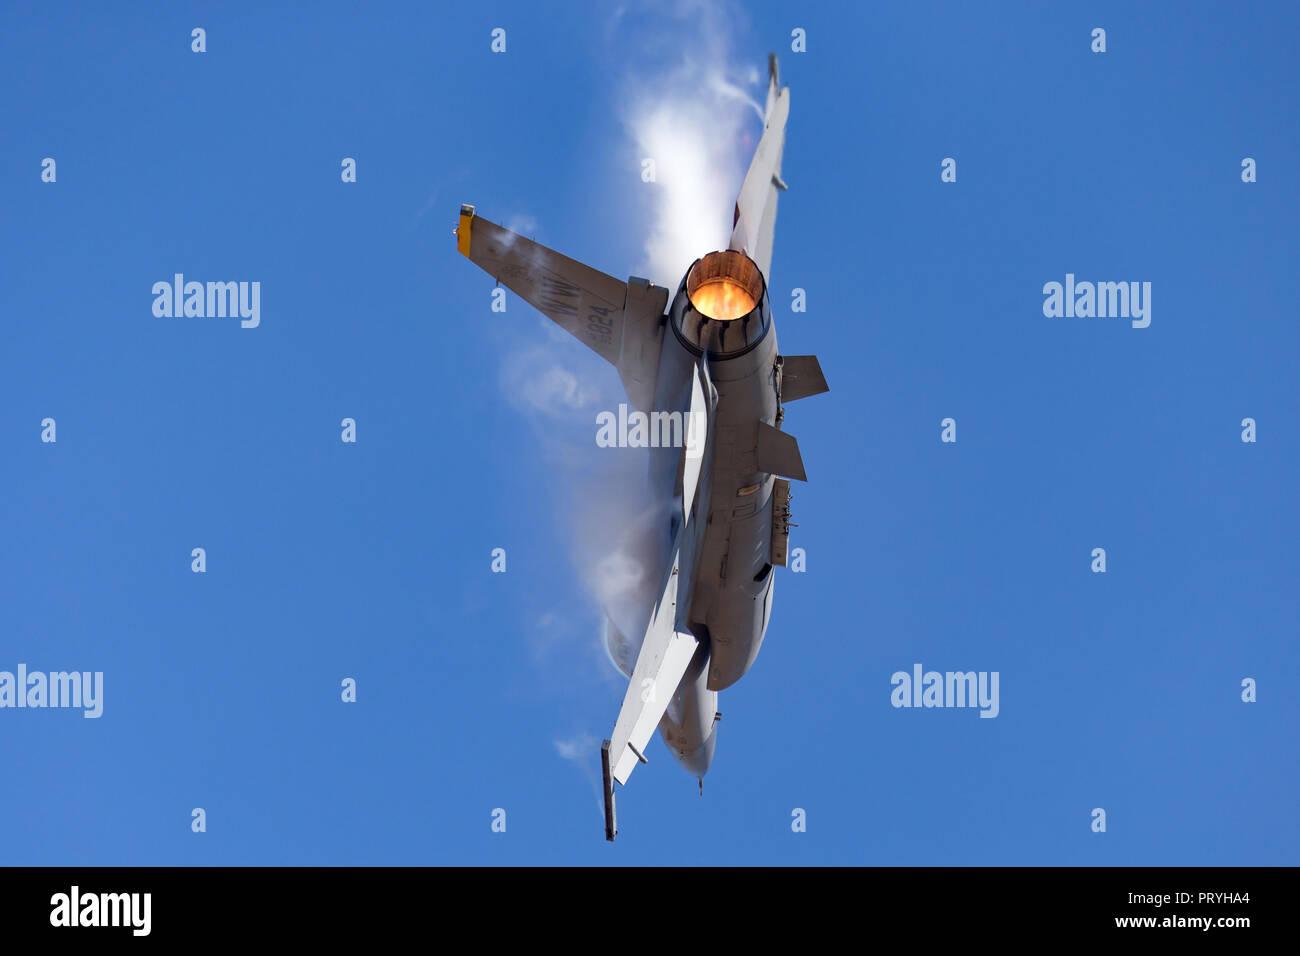 Naciones Staes Air Force (USAF) Lockheed F-16CJ combates Falcon 90-0824 del 14th Fighter Squadron, 35ª Ala de caza en la Base Aérea de Misawa, Japón. Foto de stock